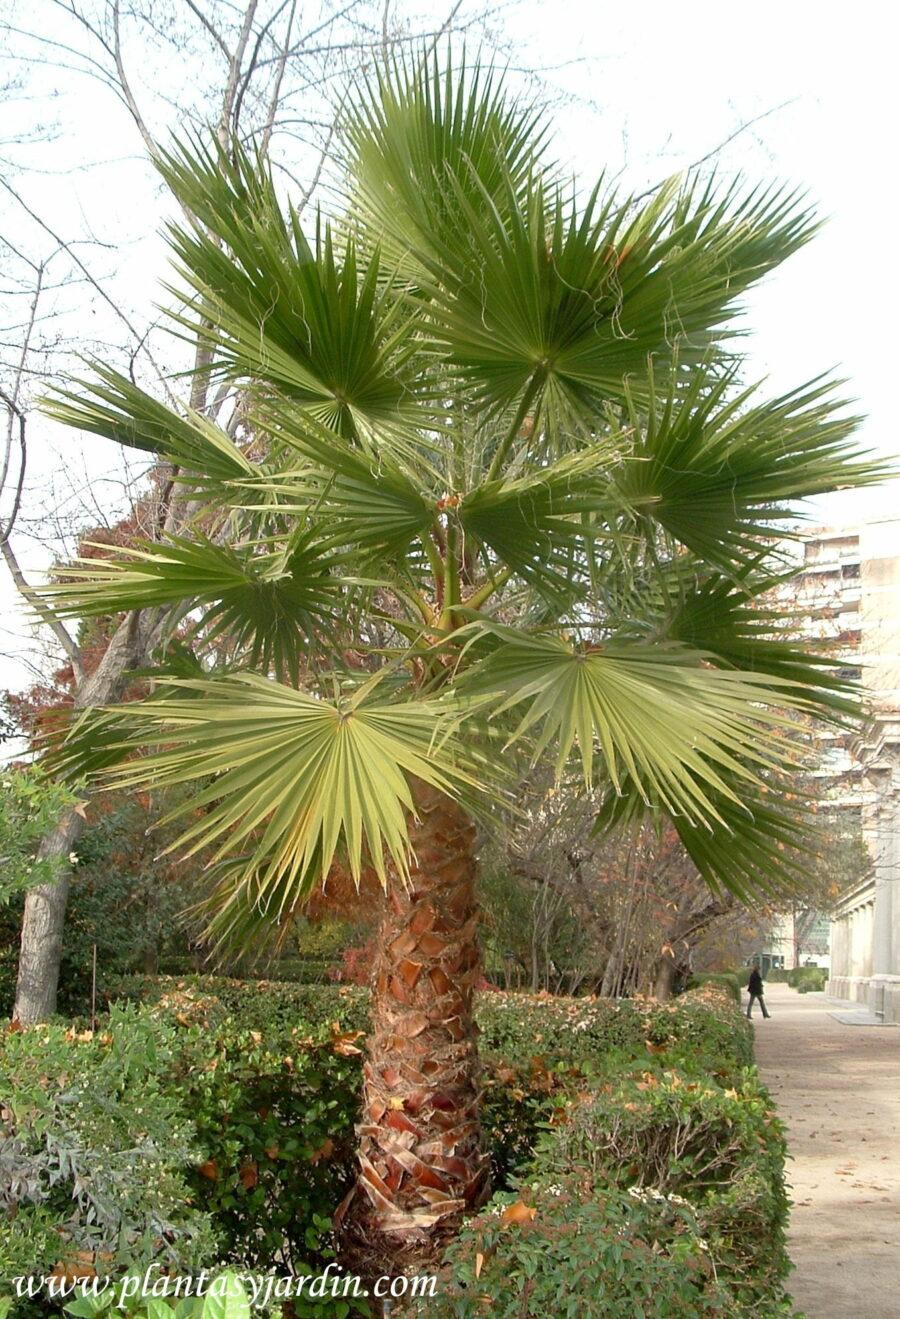 Washingtonia filifera